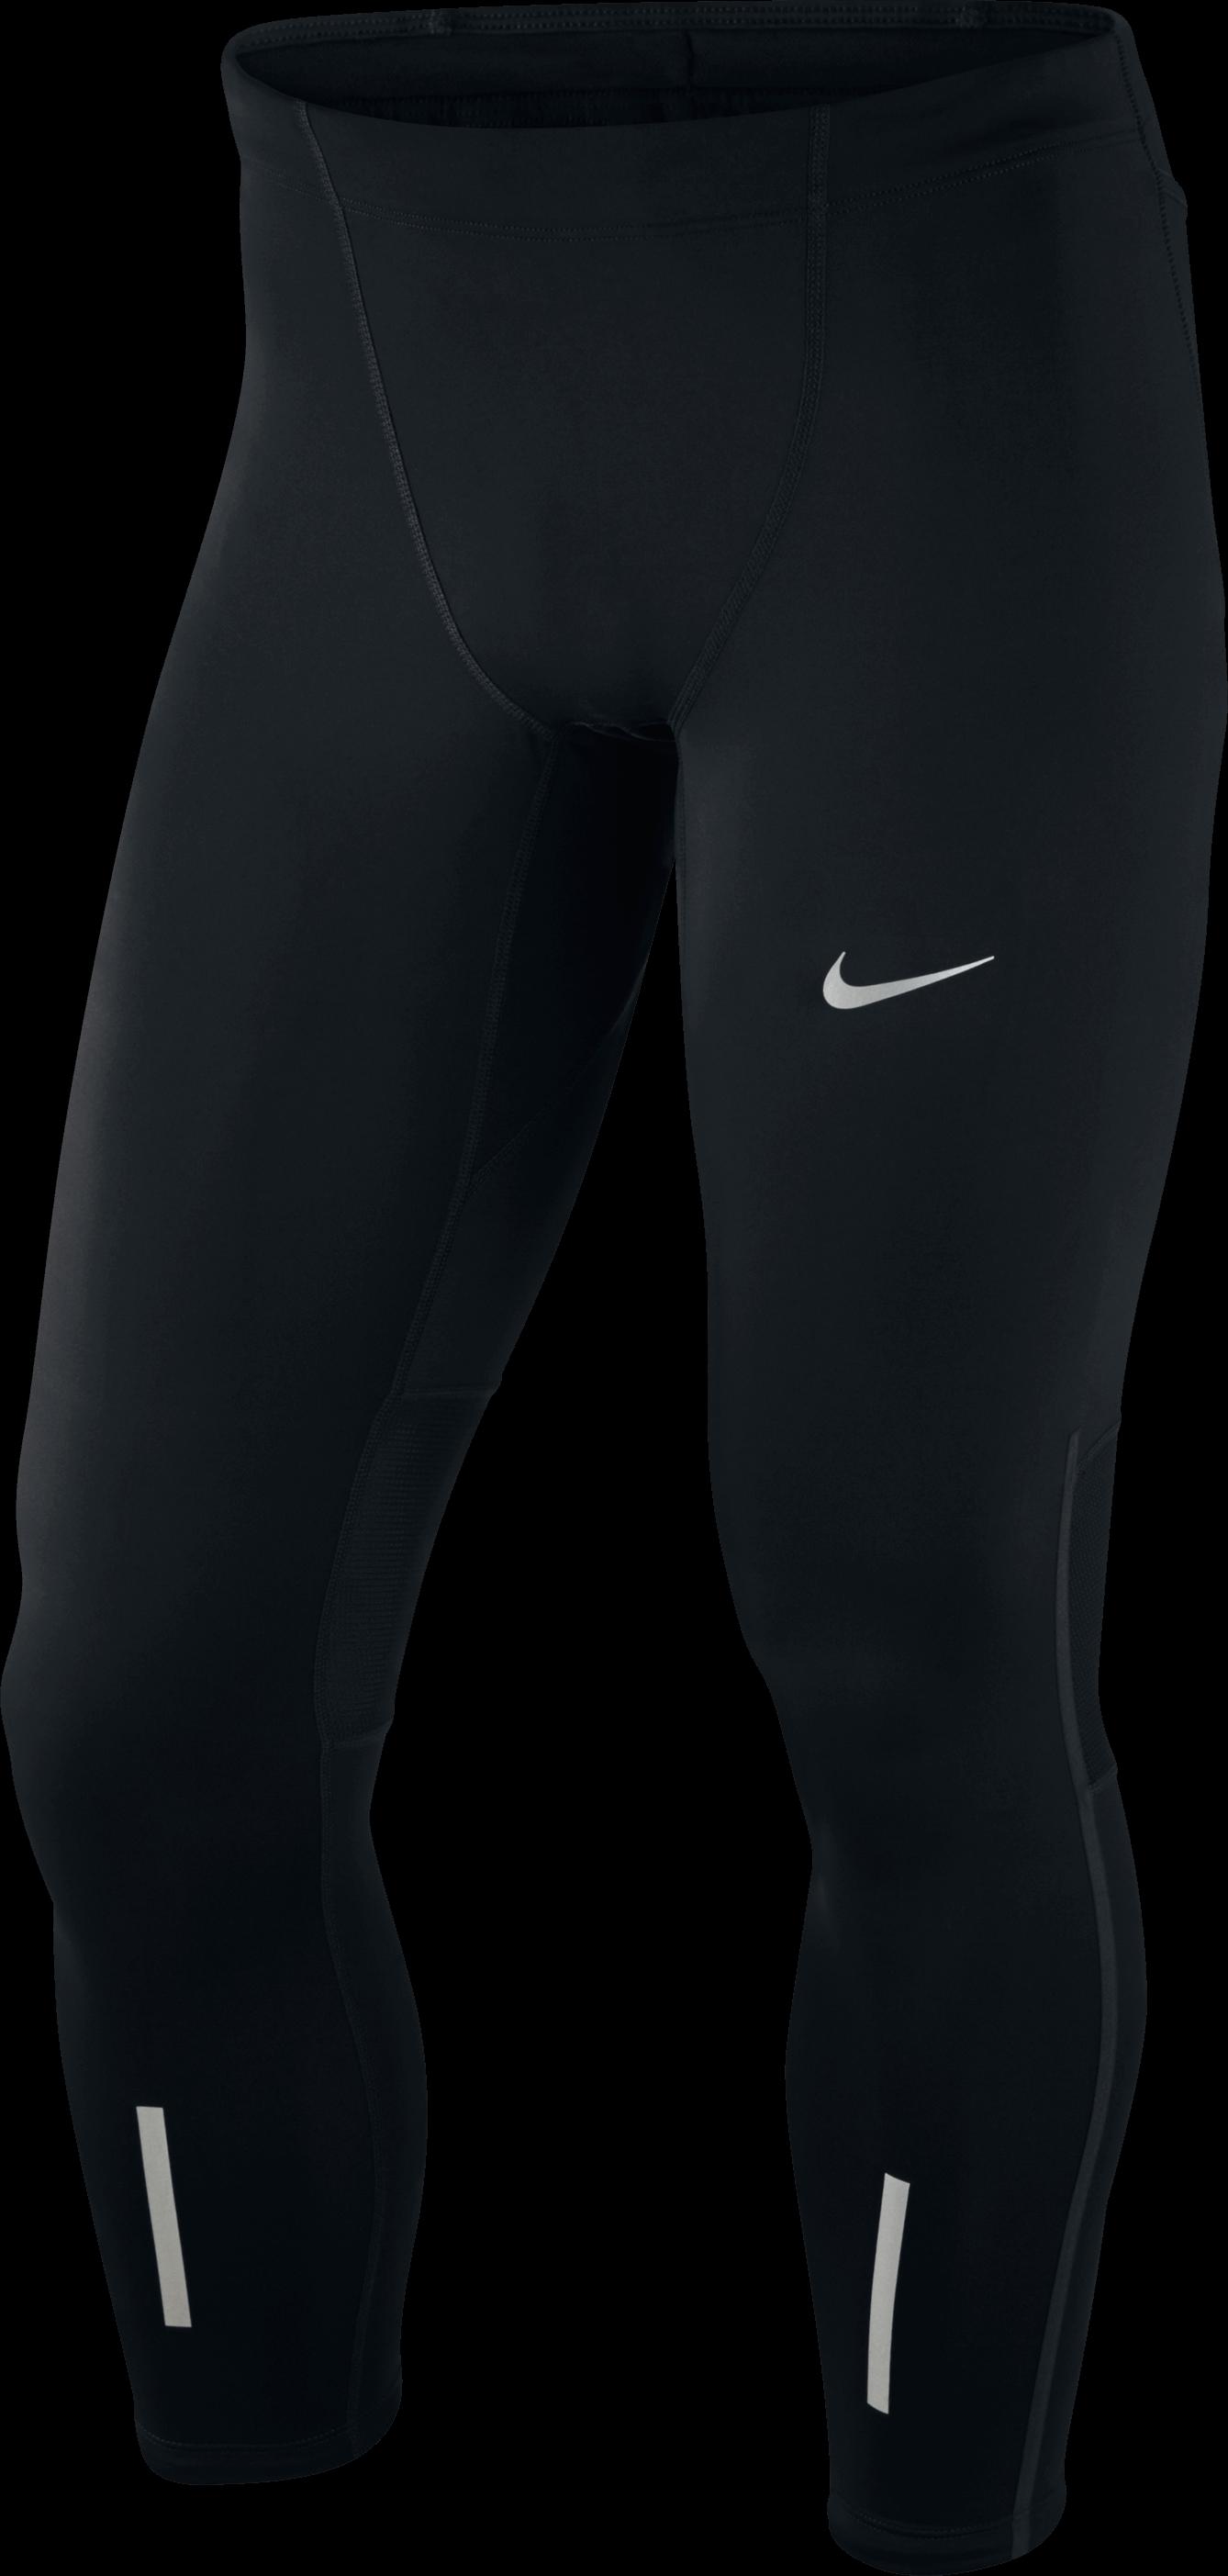 e0f4bd4019d205 Nike Power Tech Running Tight Laufhose - schwarz